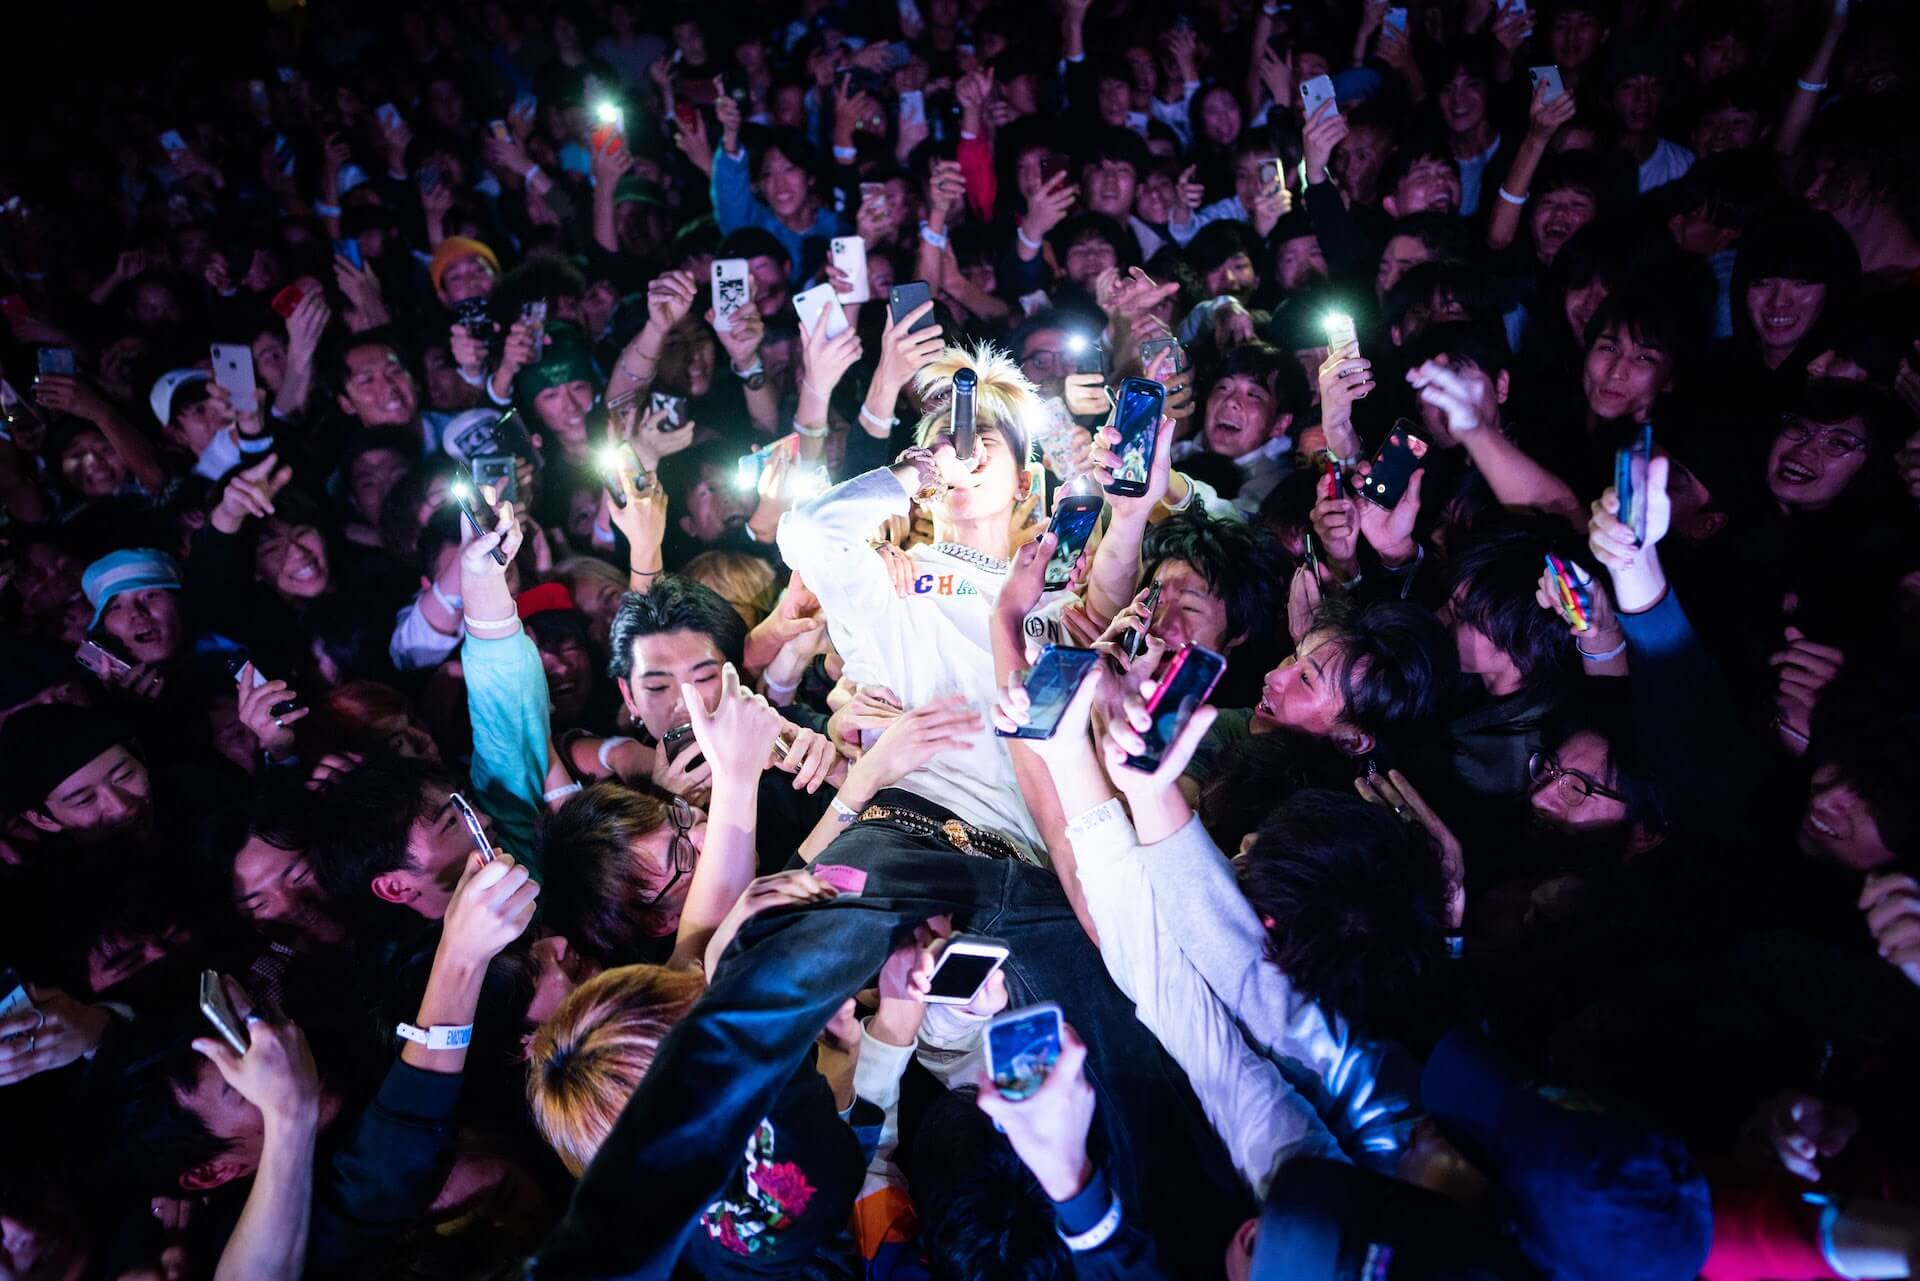 "LEXが最新EP『NEXT』を急遽リリース!<STAR TOUR>のオン・オフショットで構成したMV""95 Project""も公開 music200415_lex_next_02"